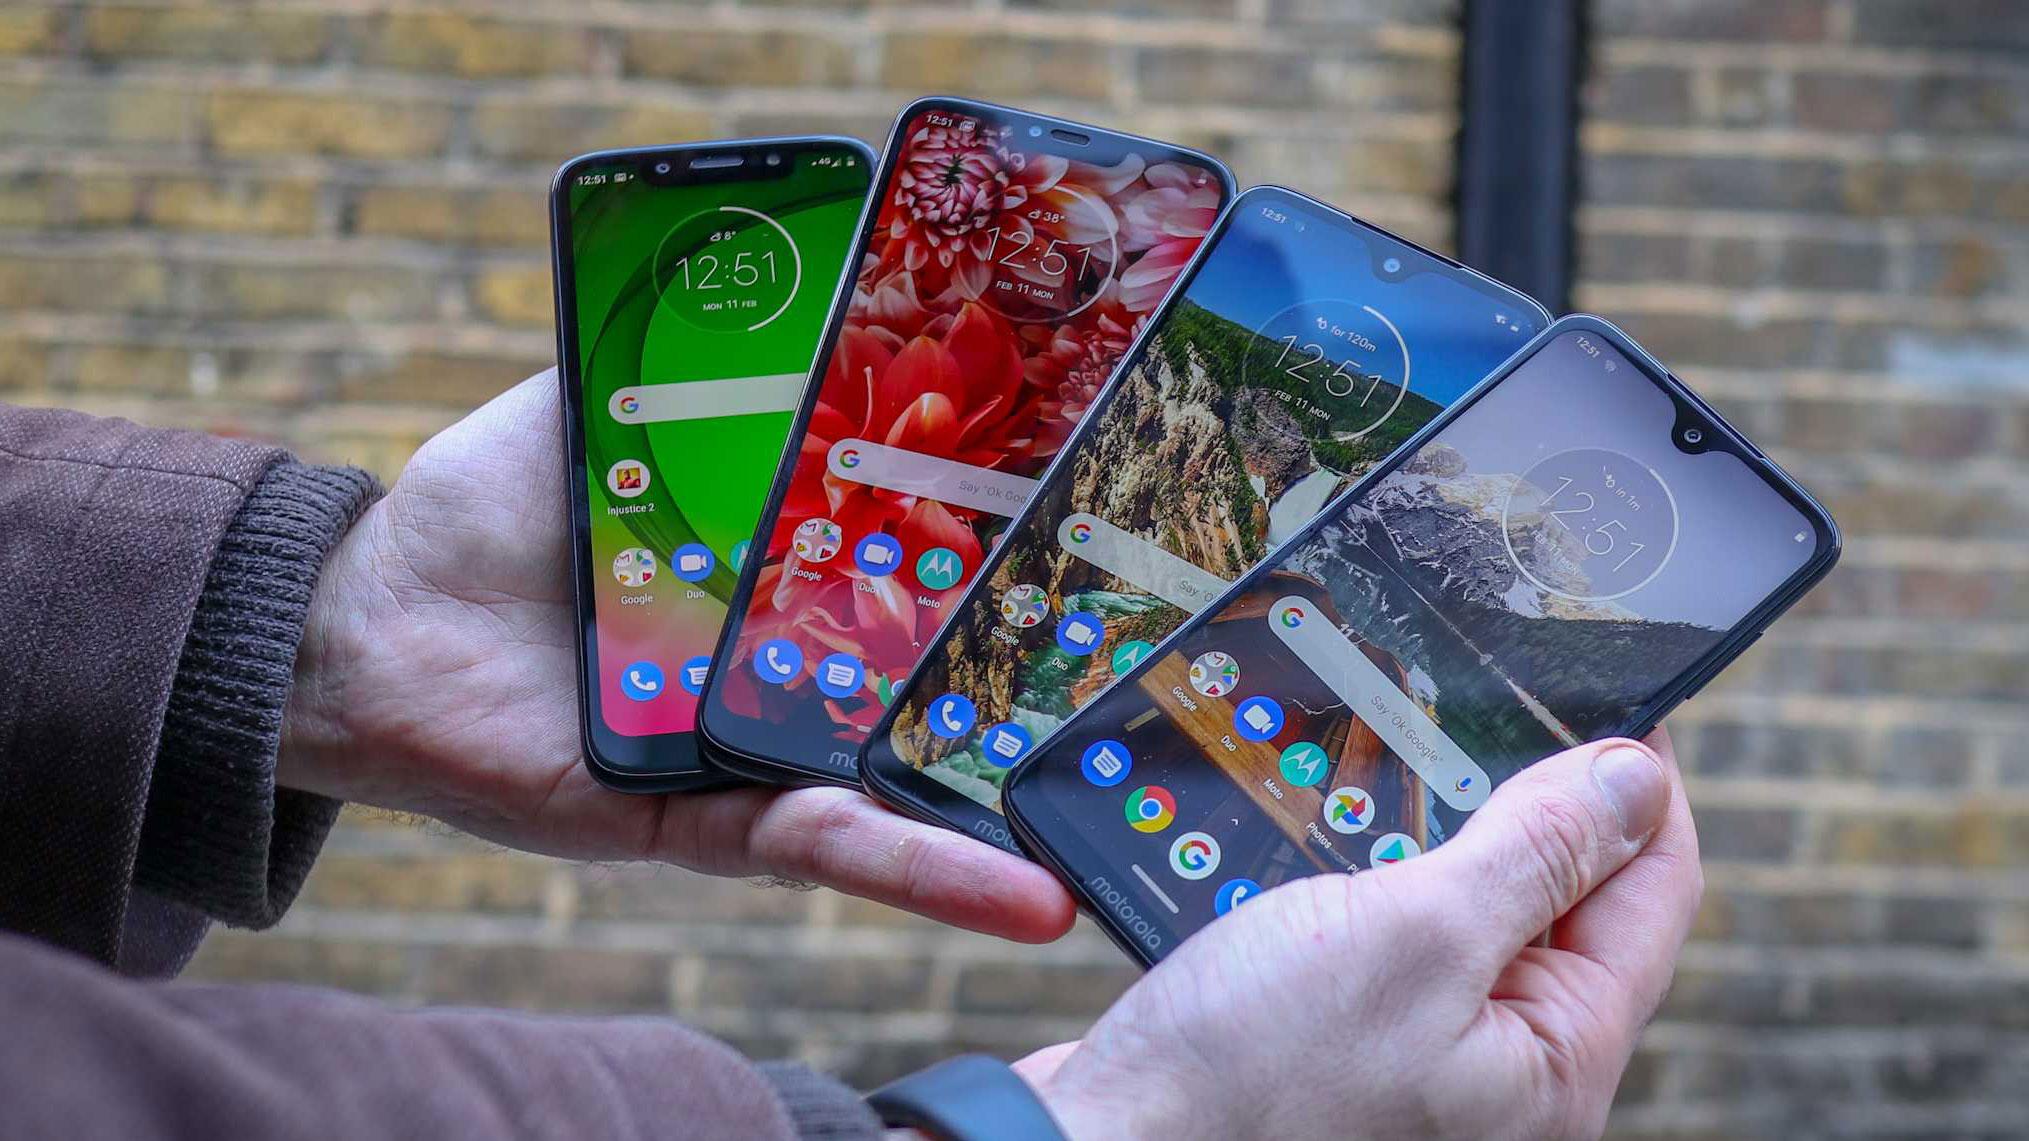 Best Motorola Phone 2020.Moto G8 Release Date Price News And Leaks Techradar